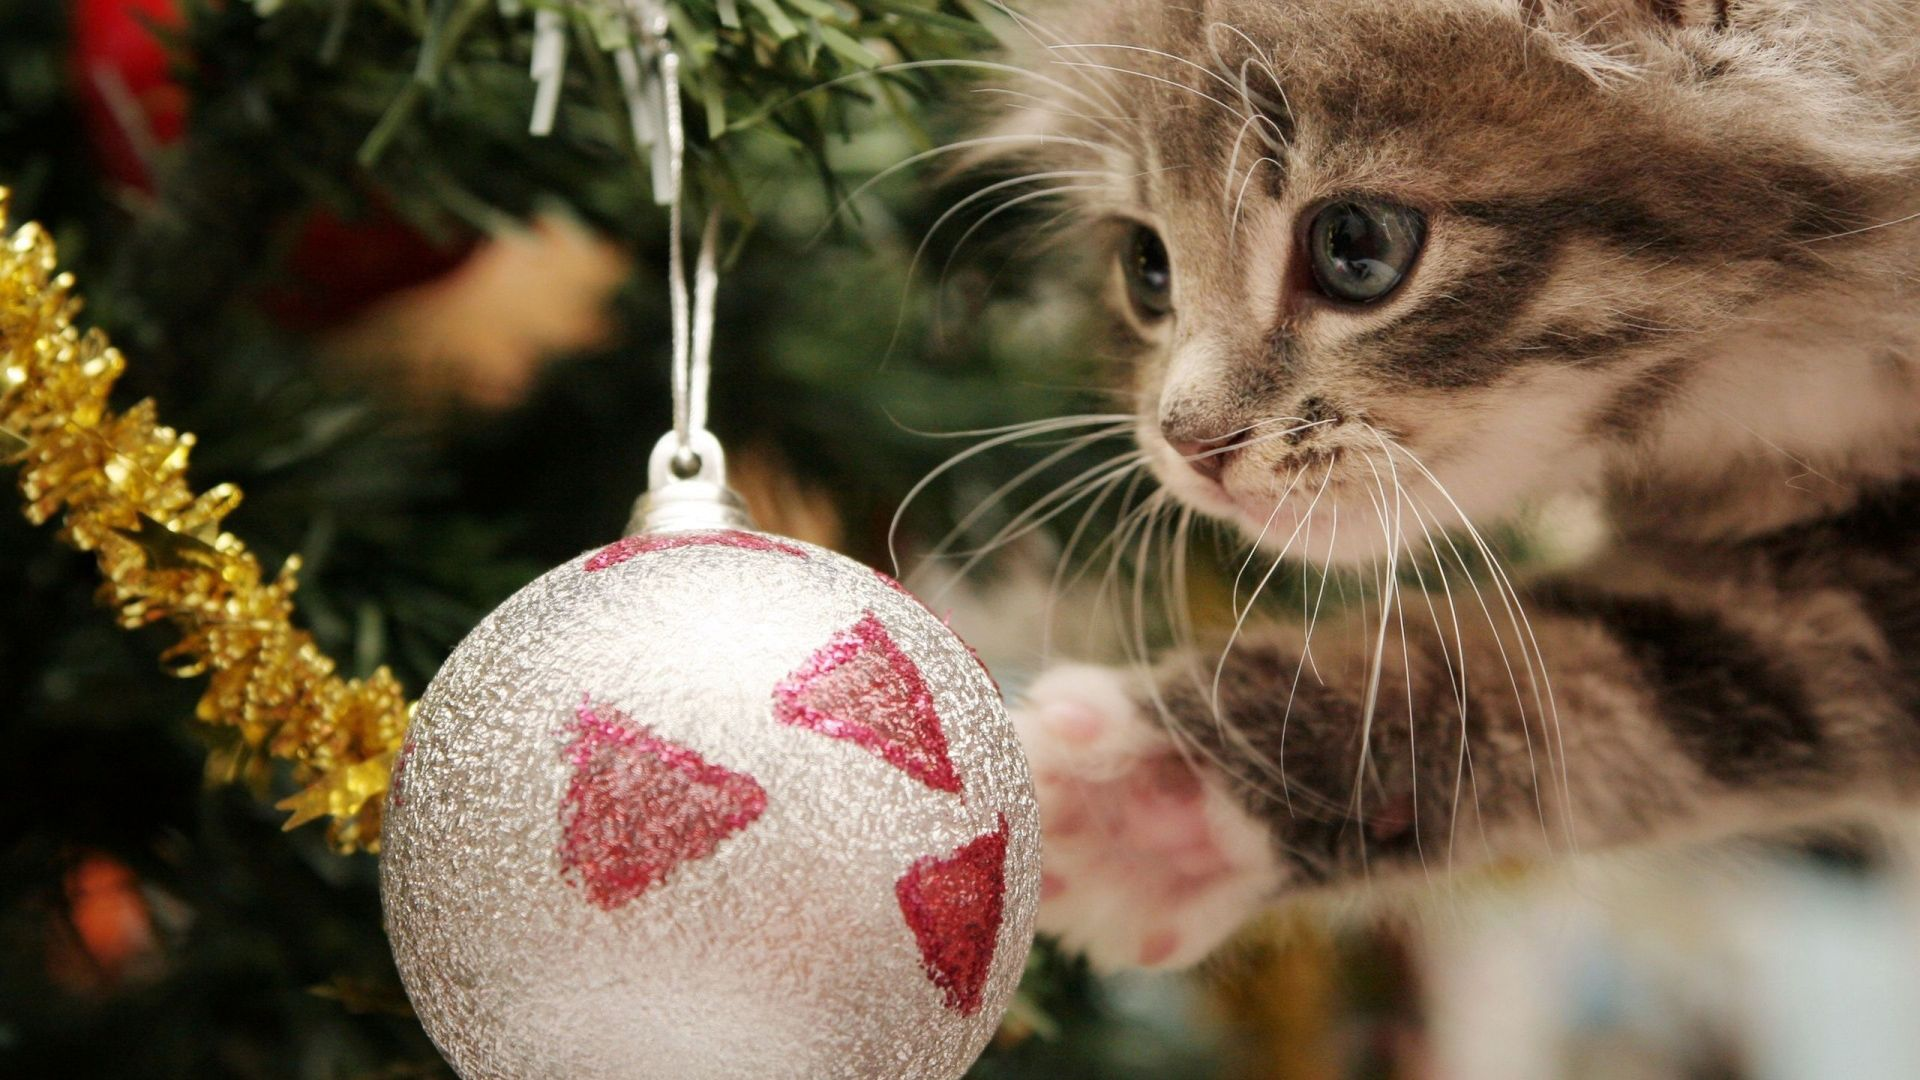 super-cute-christmas-cat-full-hd-wallpaper-christmas-ball-1080p